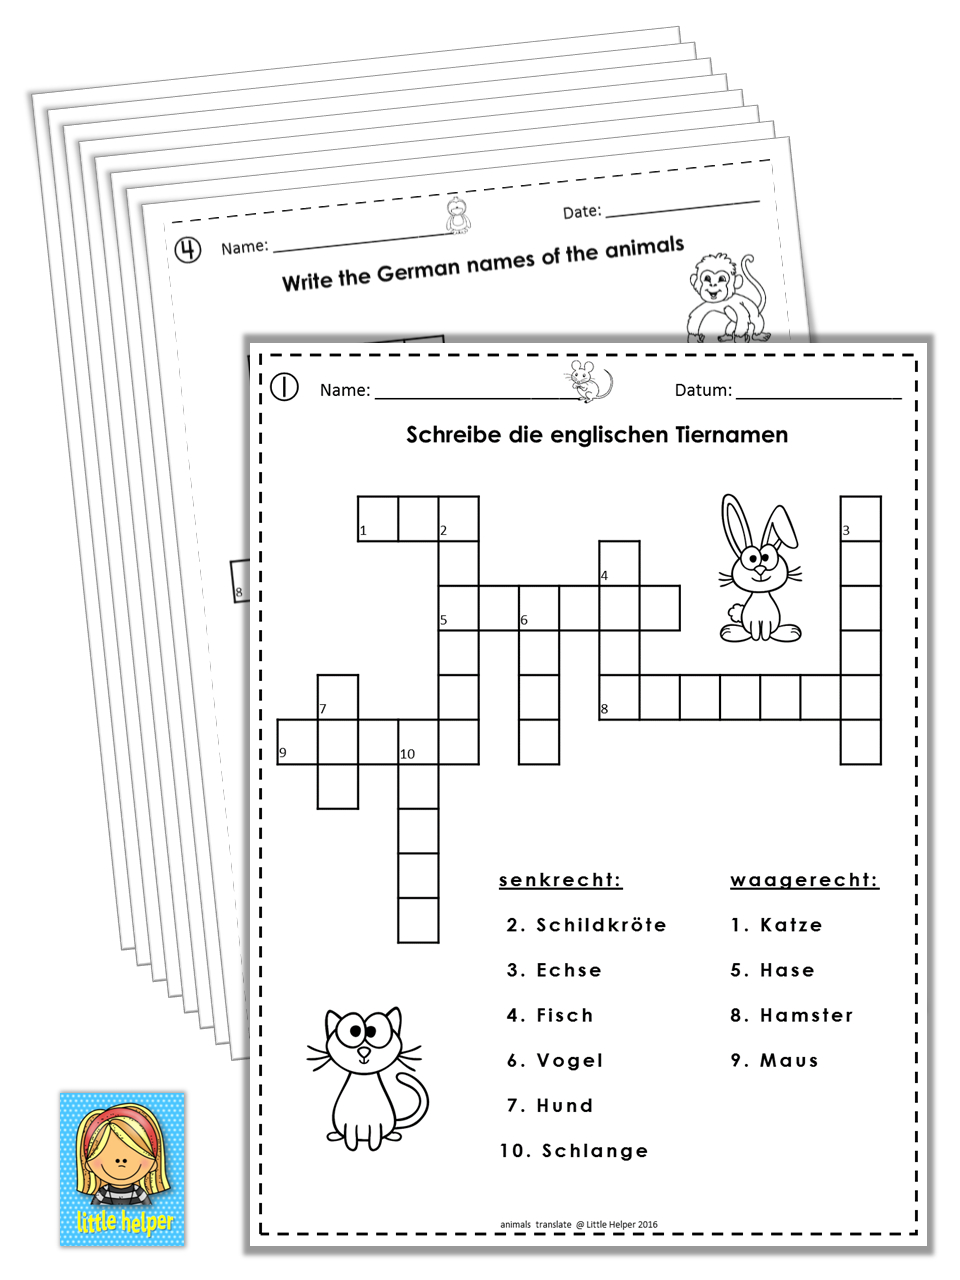 German/english Crossword Puzzles Tiere/animals | German Words - Printable German Crossword Puzzles